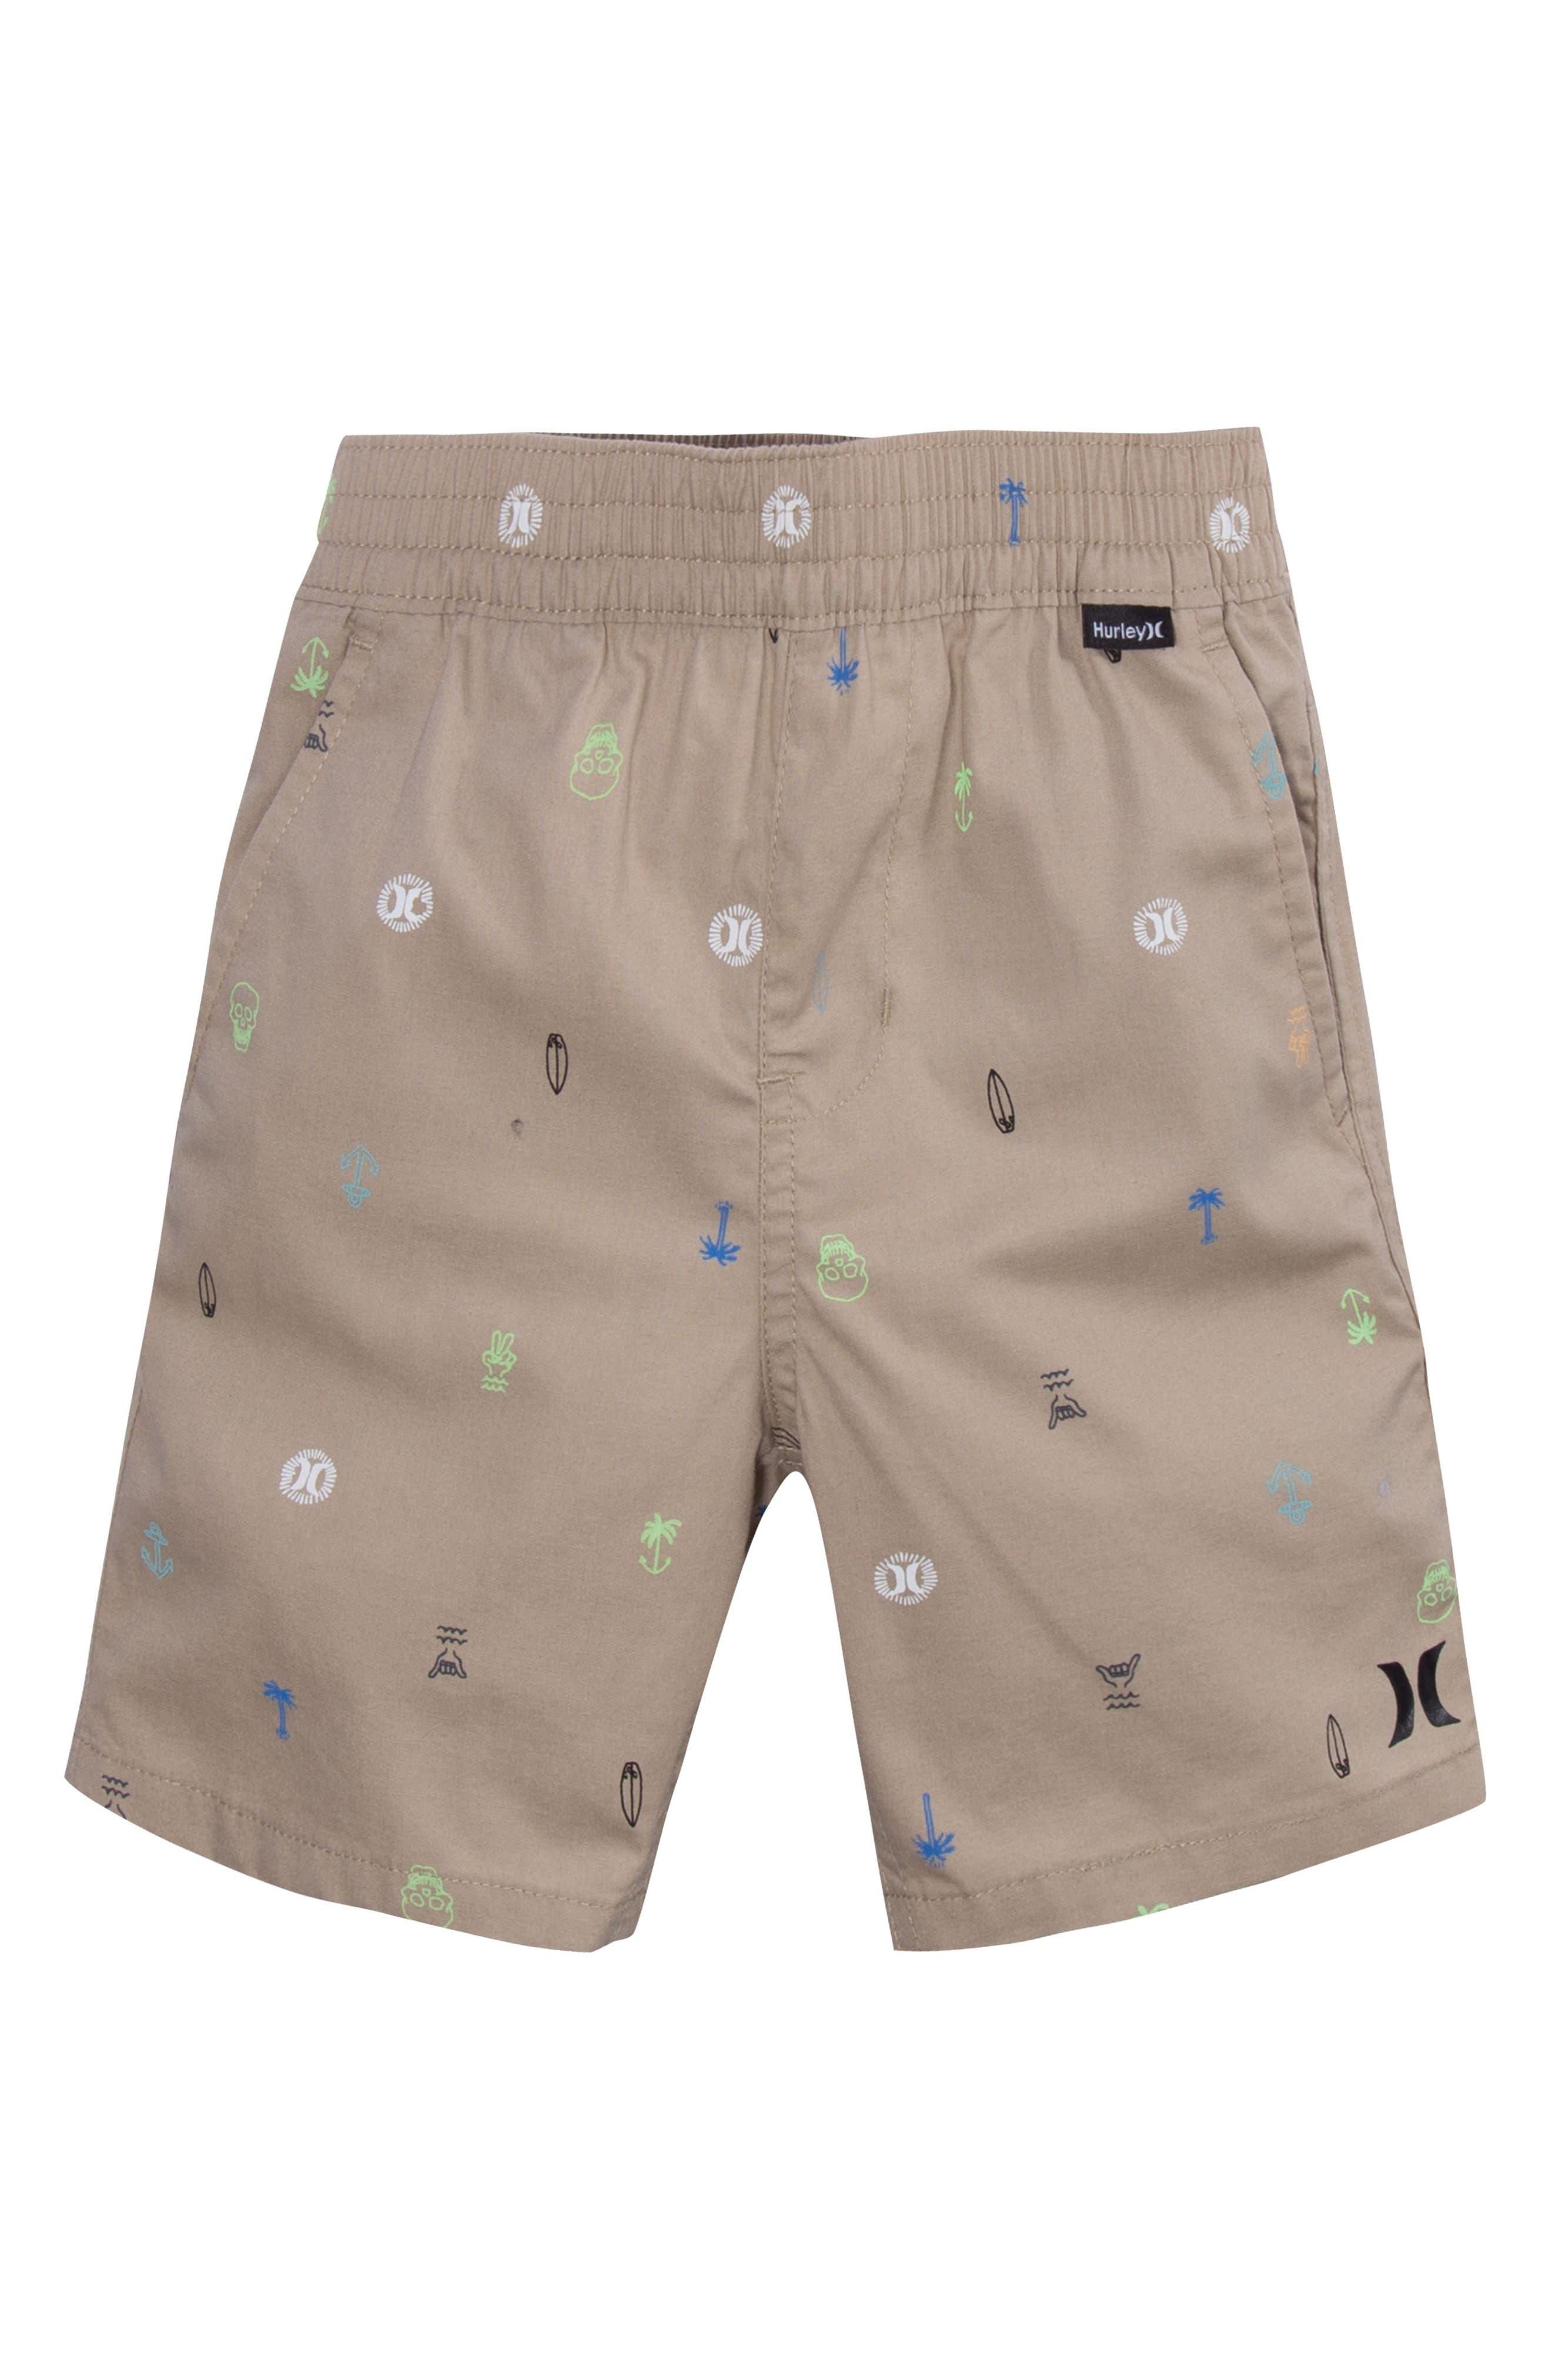 Main Image - Hurley Print Pull-On Shorts (Big Boys)